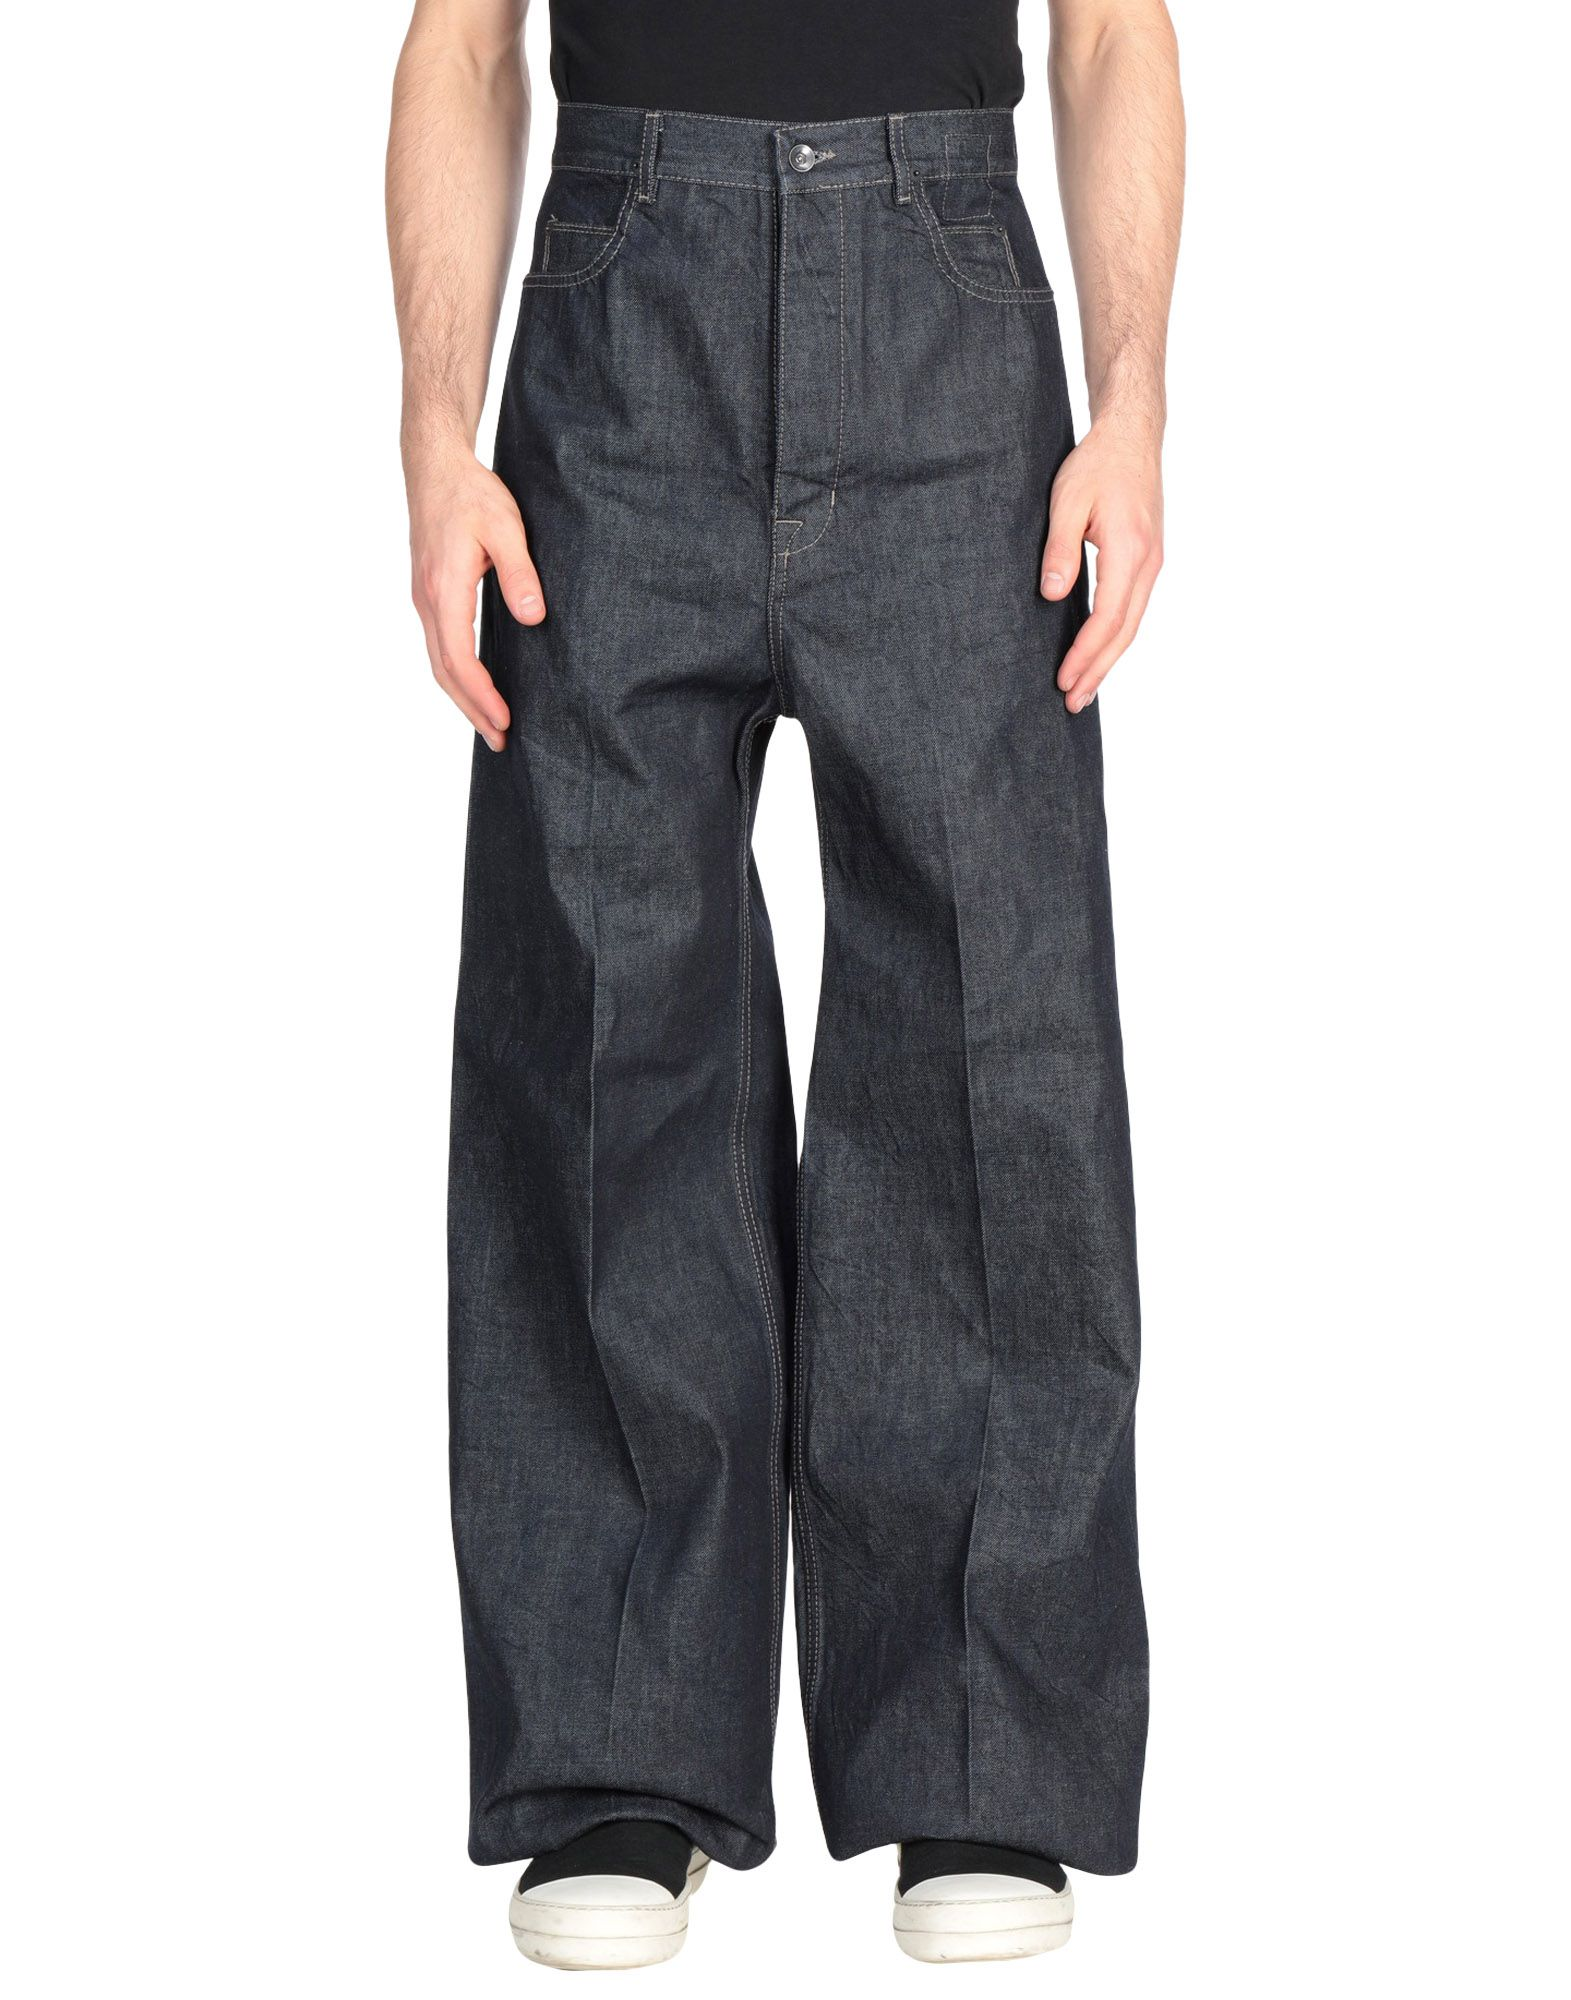 DRKSHDW by RICK OWENS Джинсовые брюки блузка quelle rick cardona by heine 4025